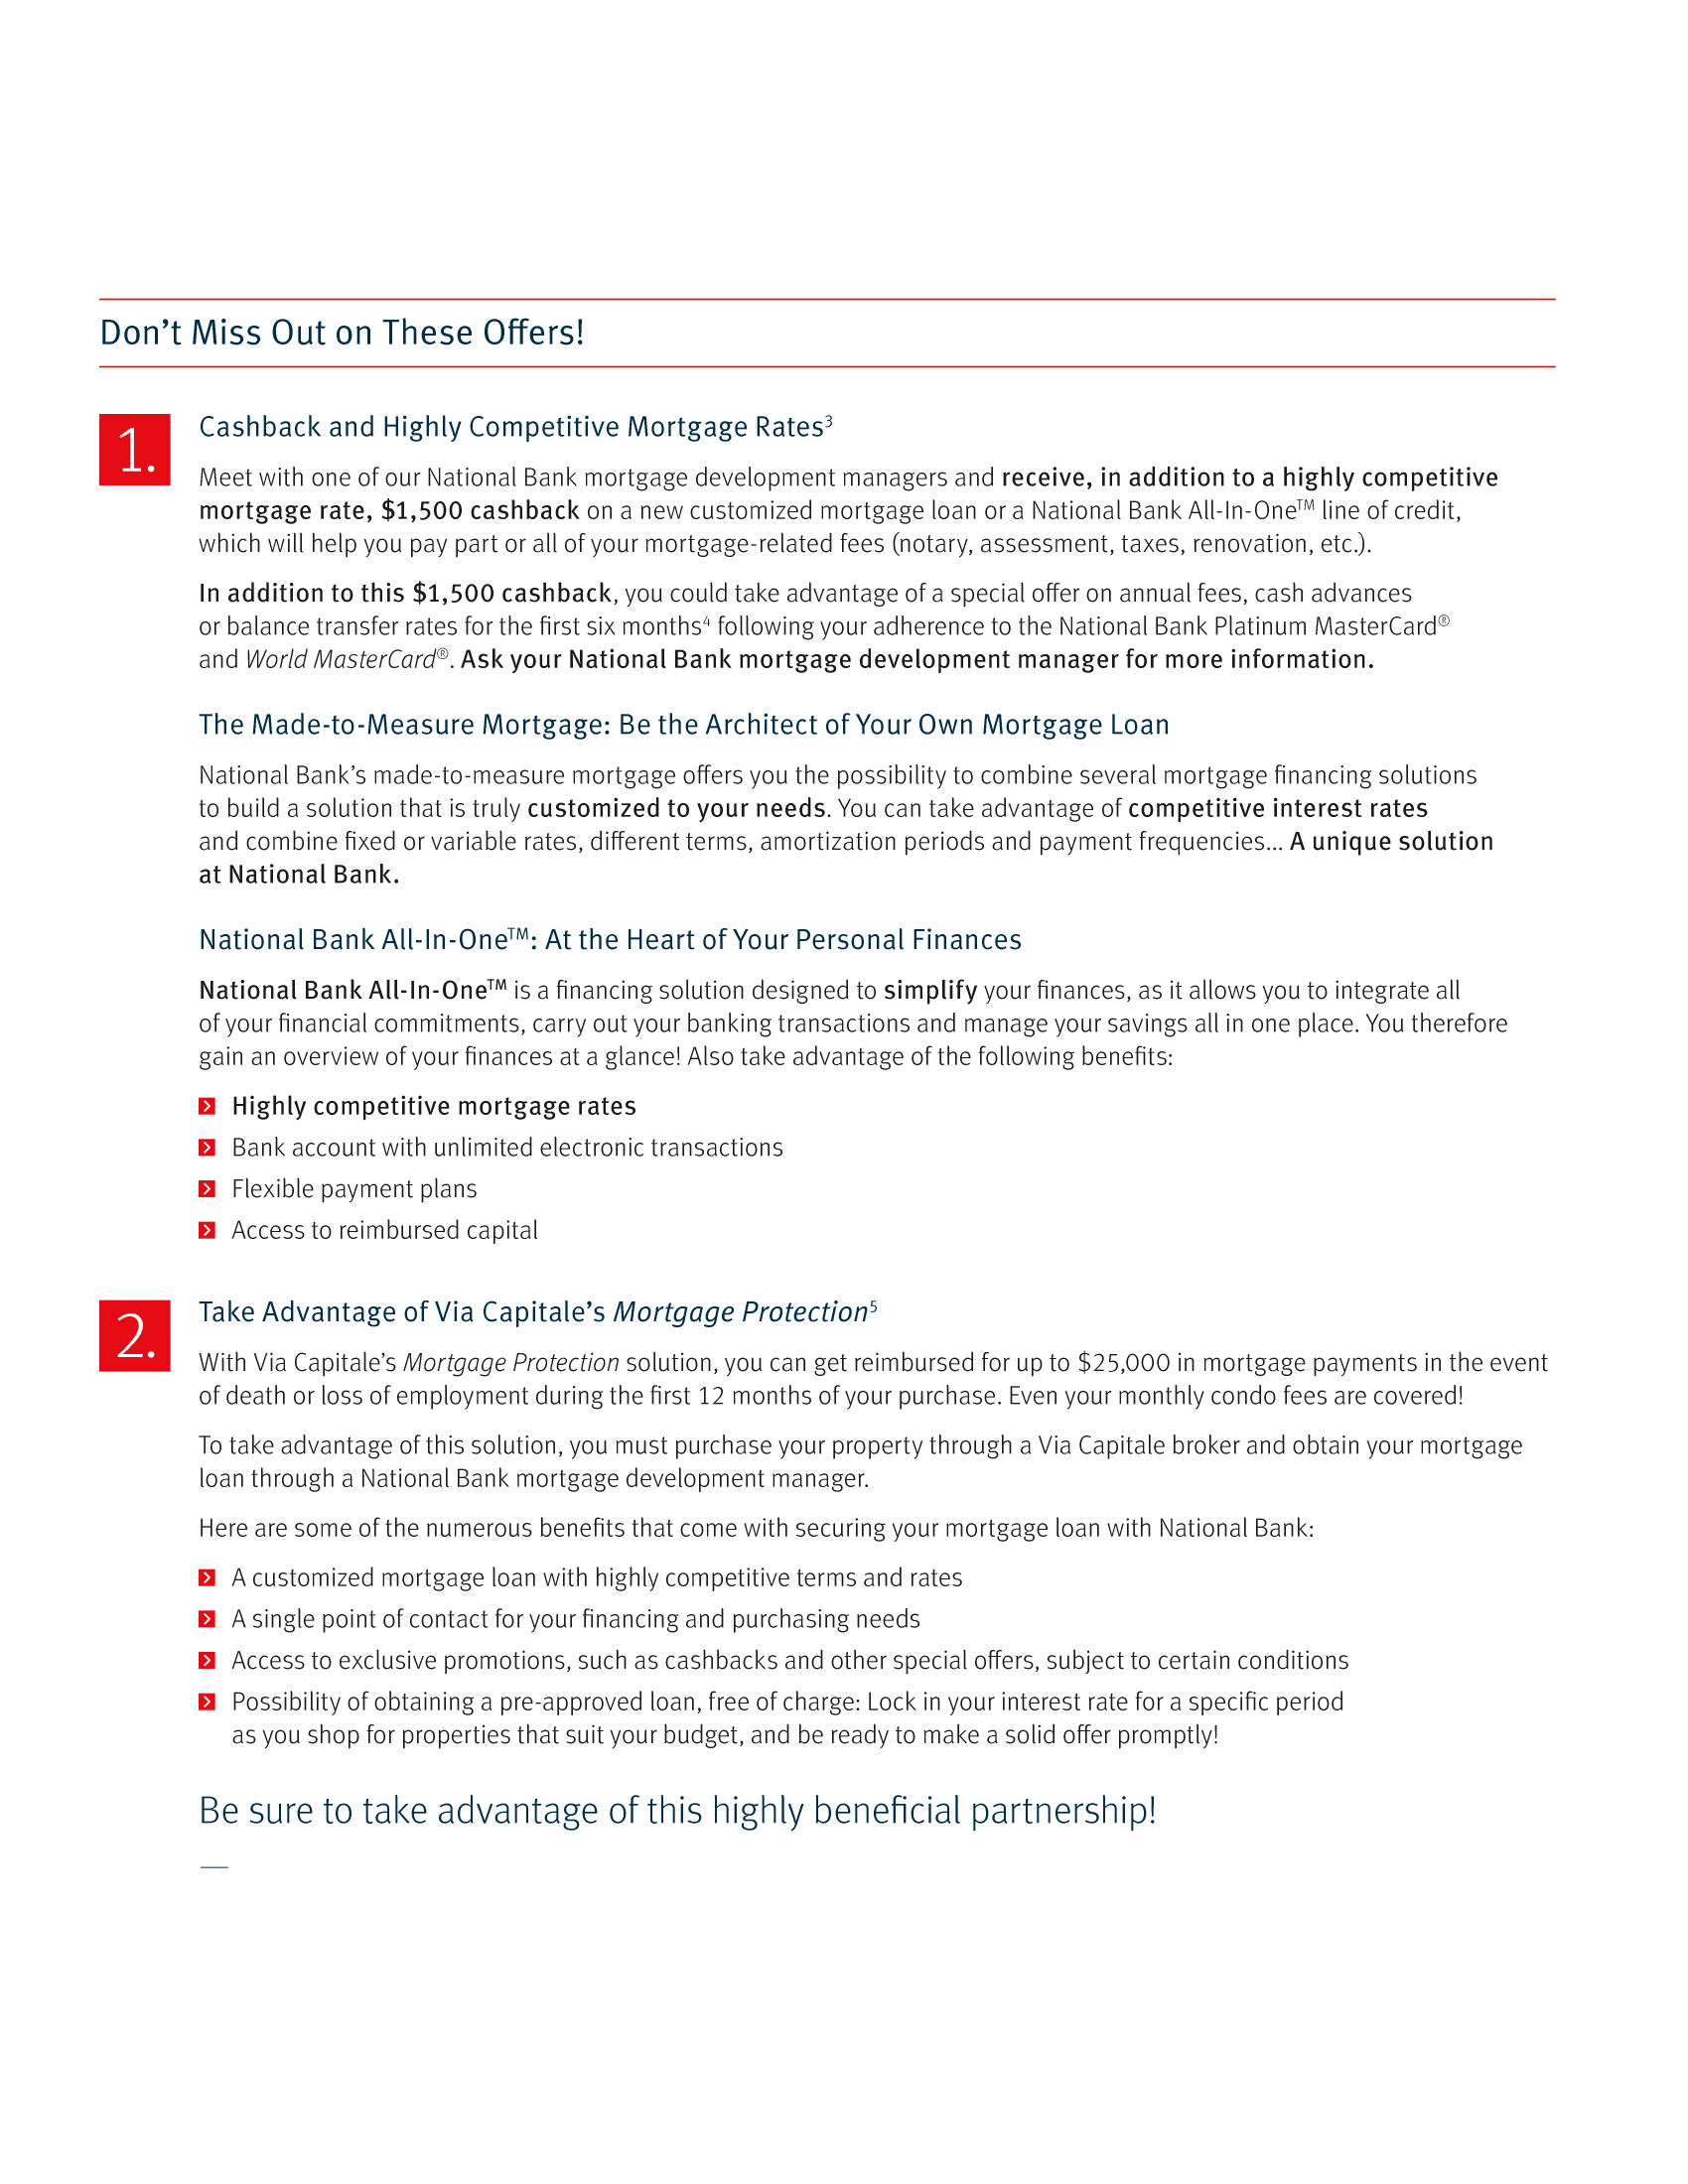 "3 | Leaflet ""A Partnership with a Wealth of Advantages"" - Via Capitale"